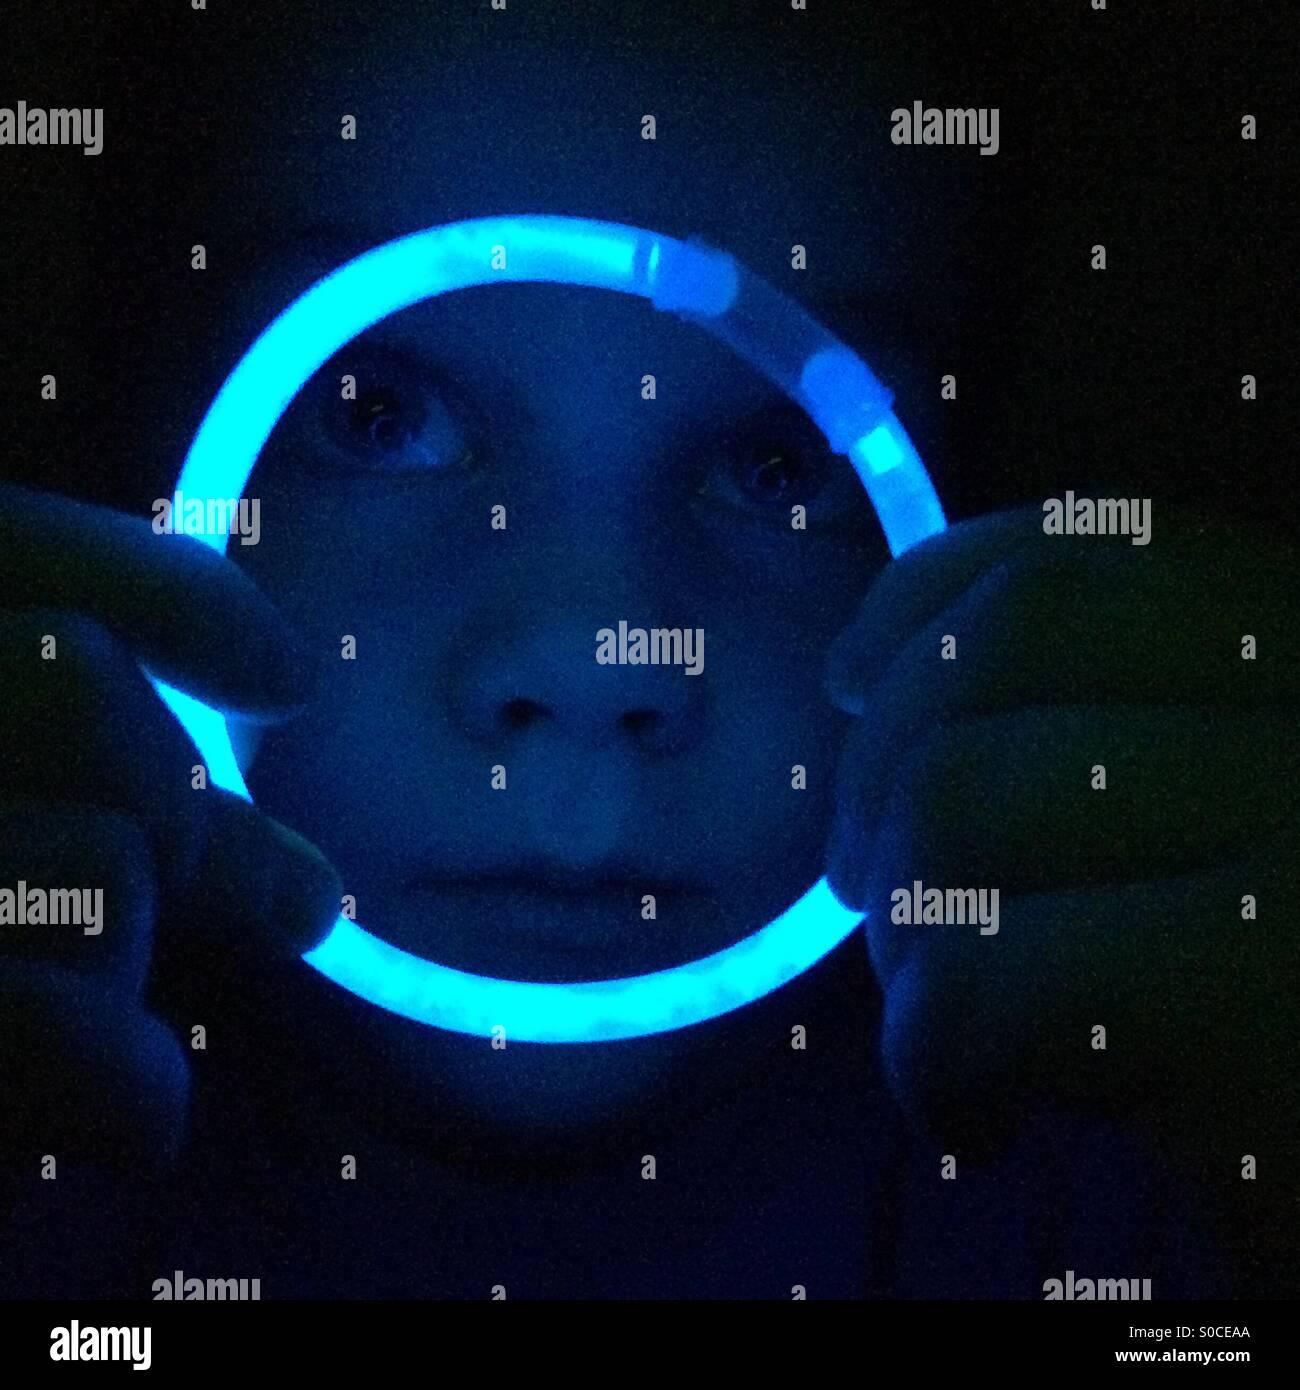 Boy looking through blue glow stick hoop - Stock Image